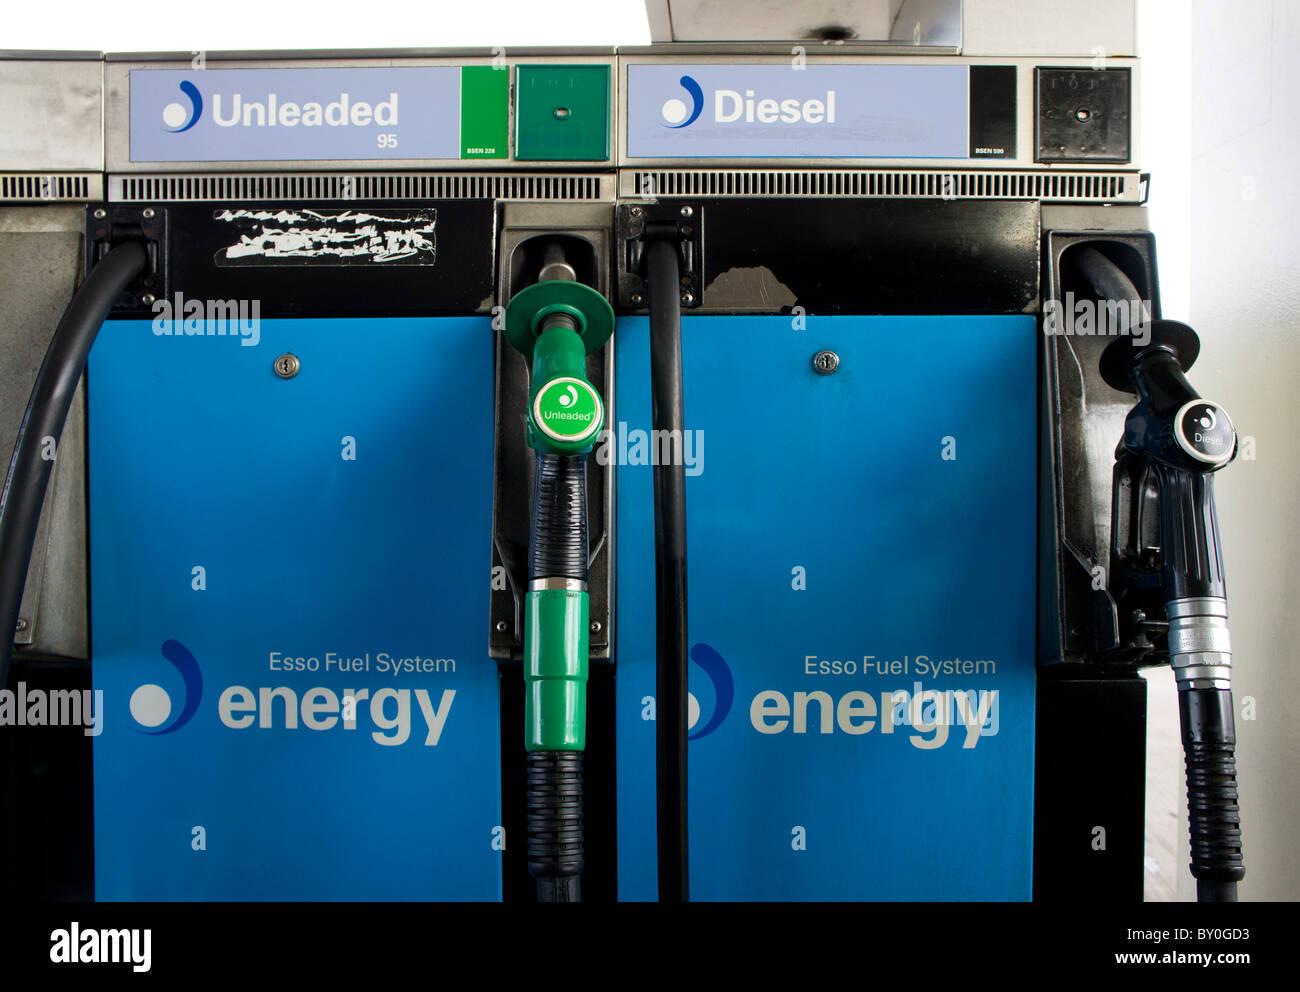 fuel pumps at a petrol station, uk - Stock Image